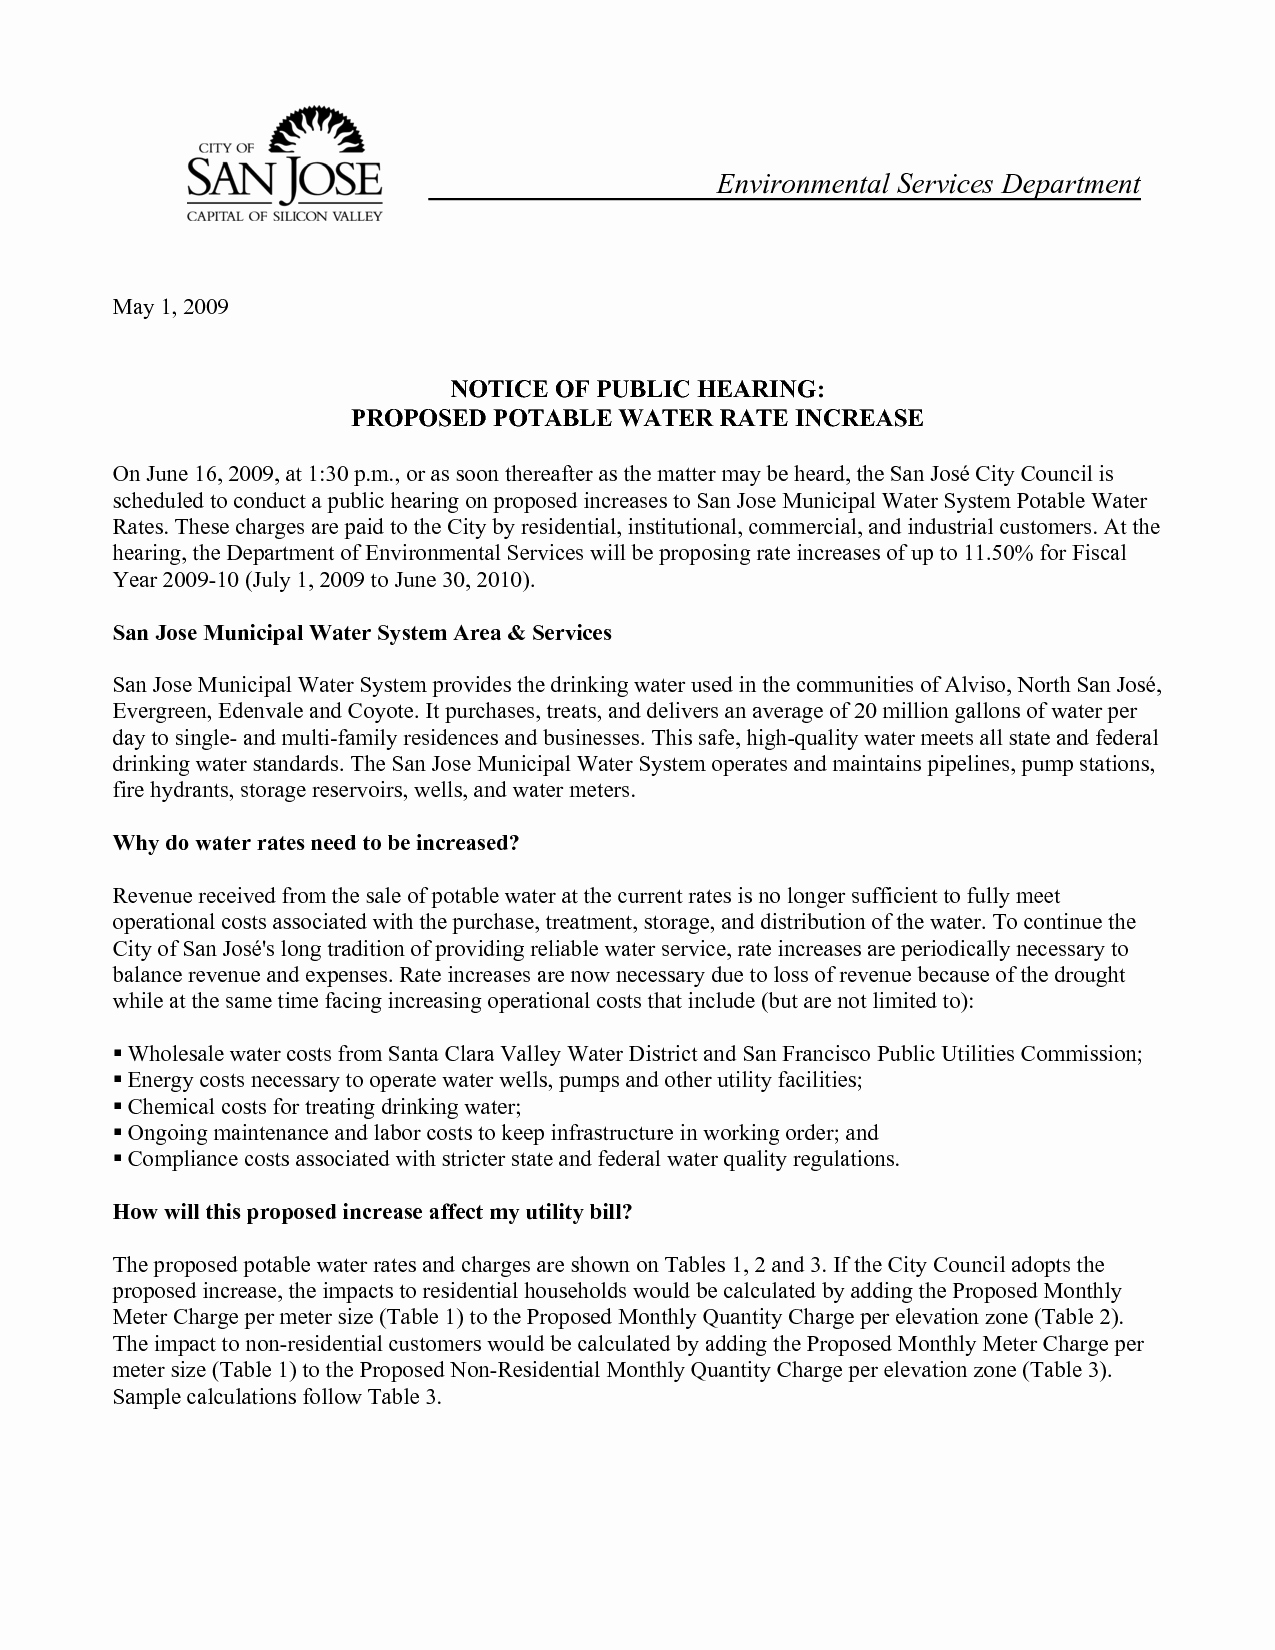 Rent Increase Letter Sample Inspirational Rent Increase Sample Letter Free Printable Documents